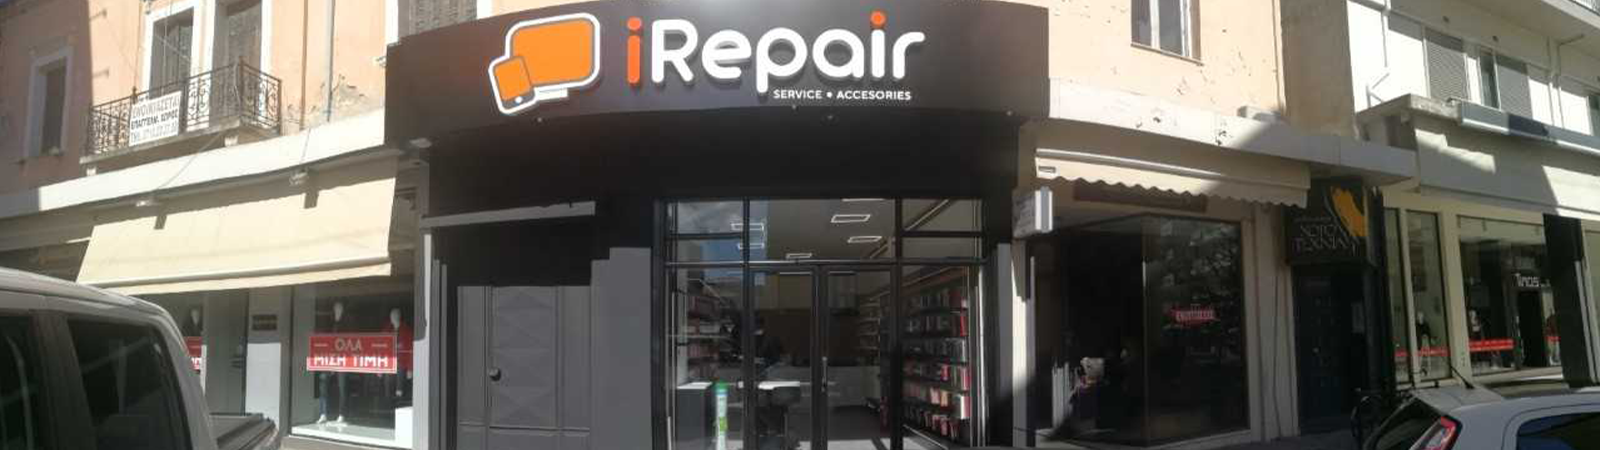 iRepair Tripoli